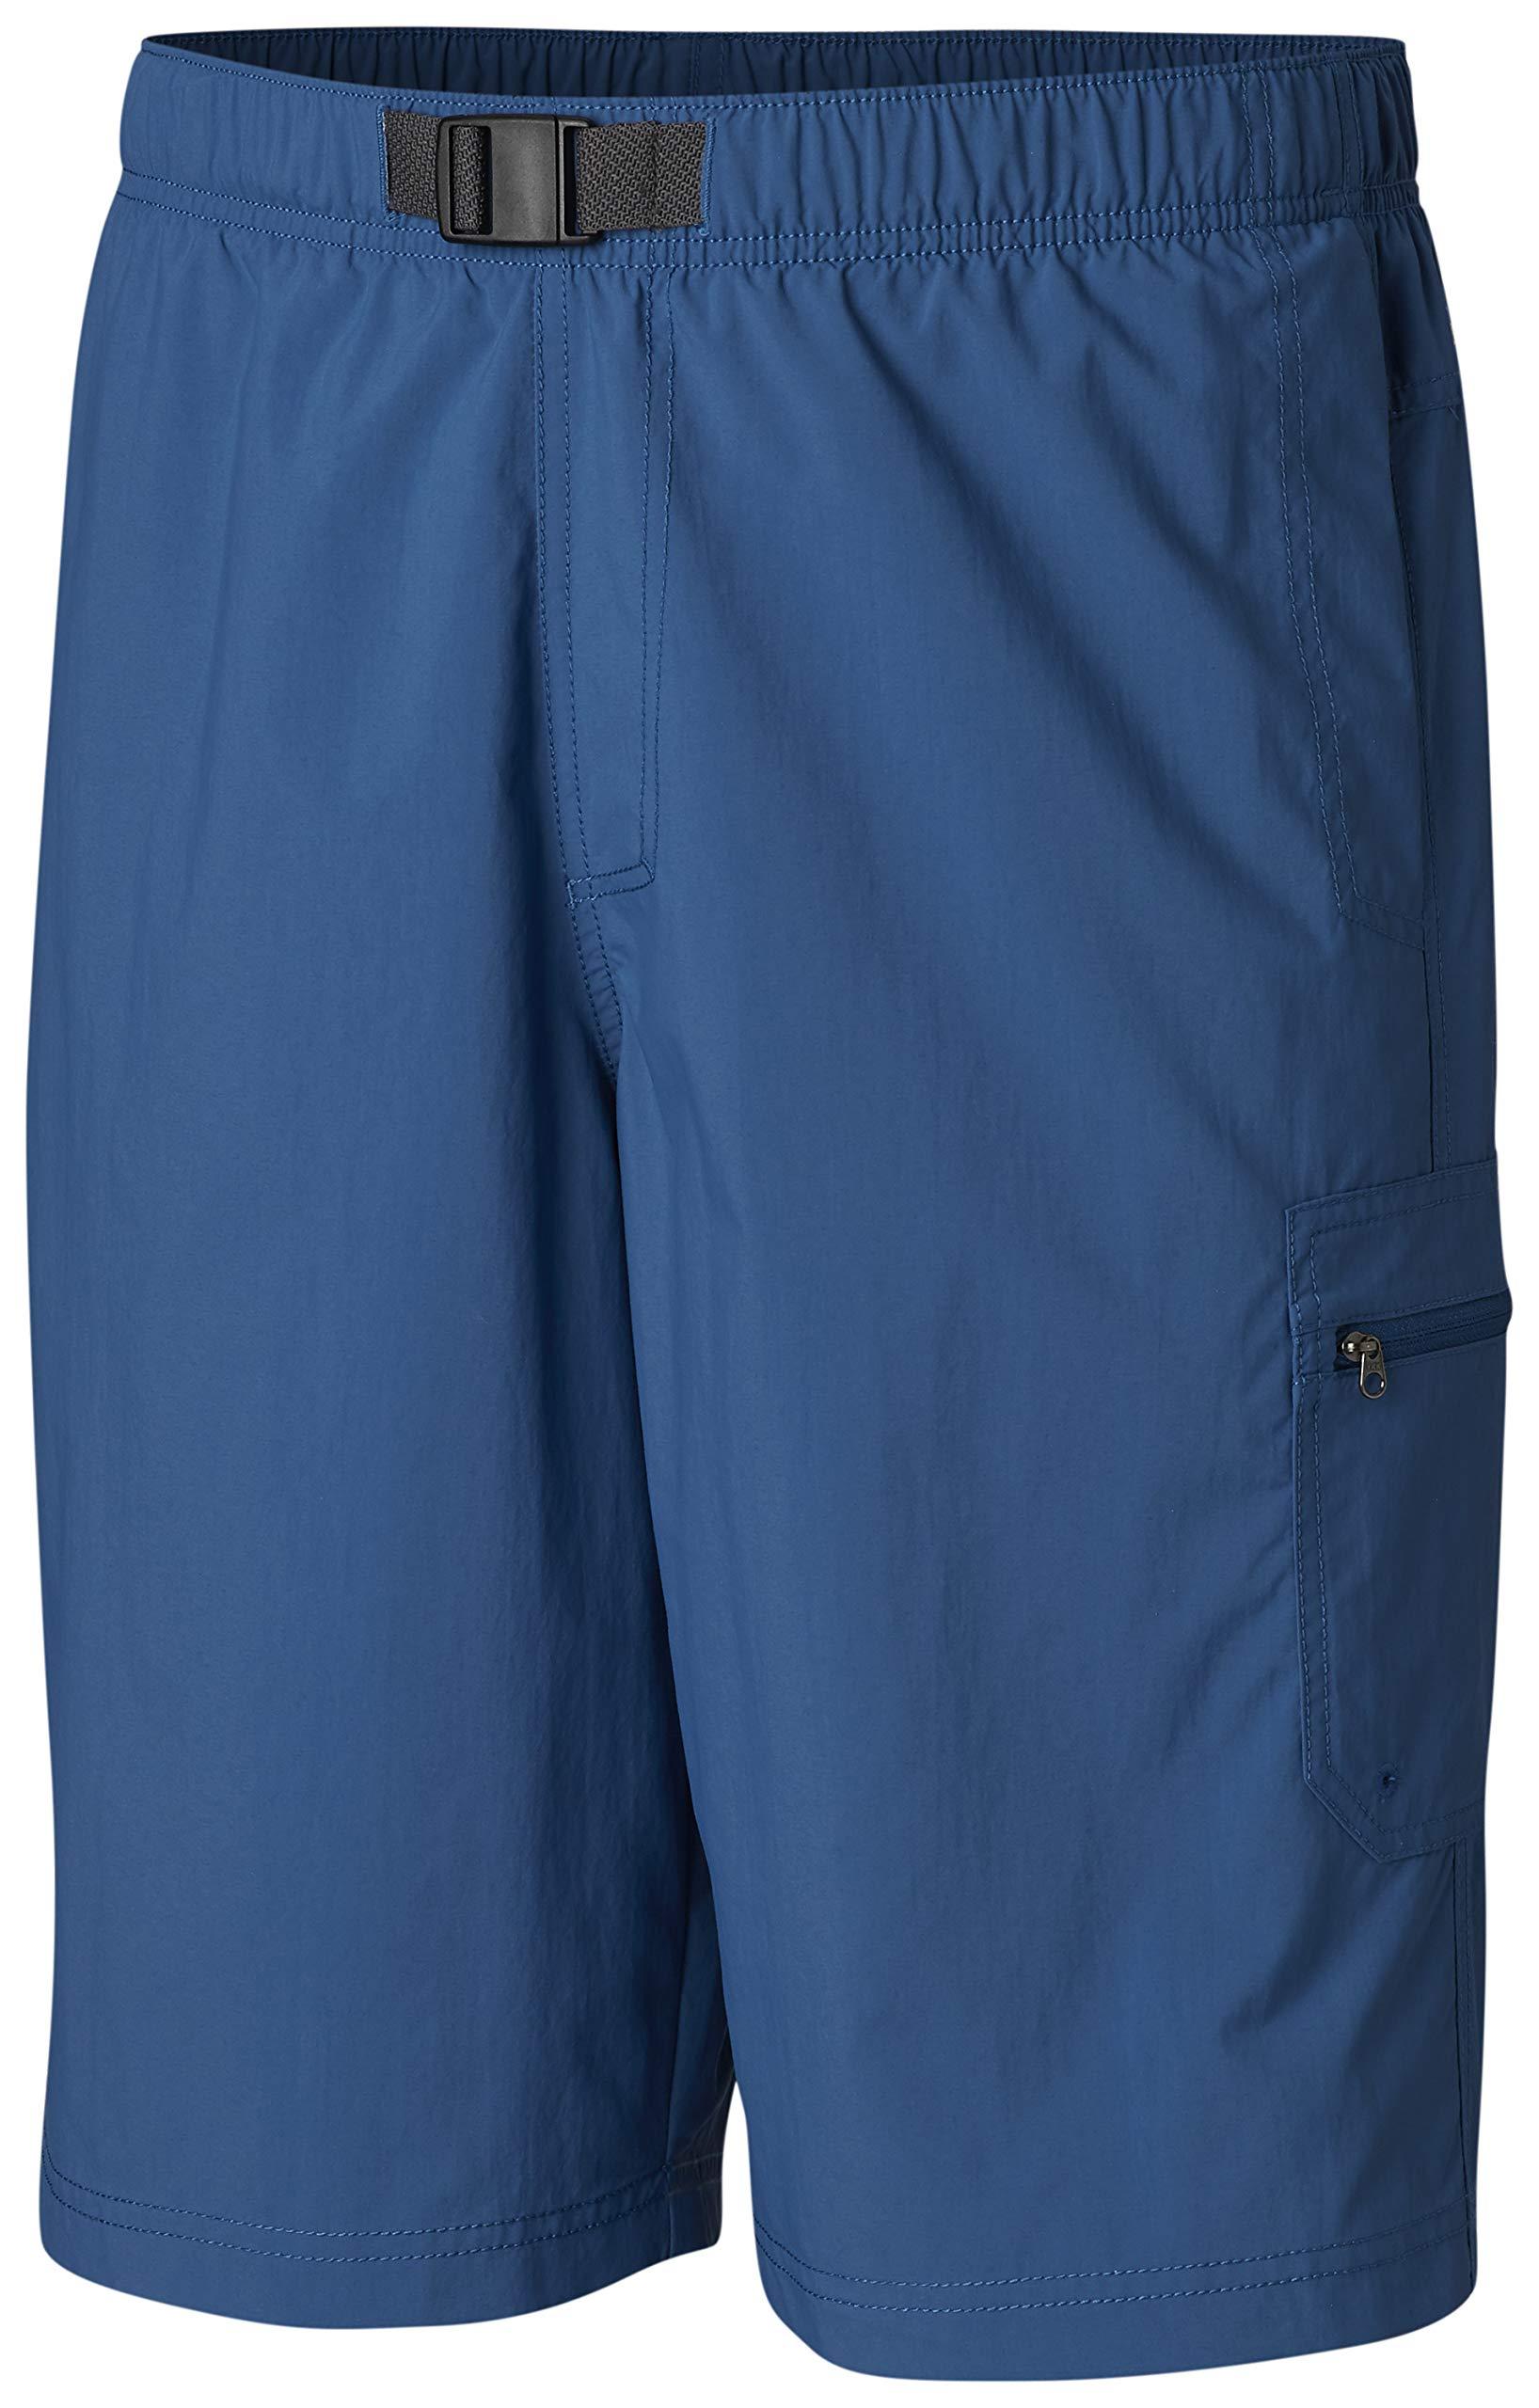 Columbia Men's Palmerston Peak Short, Waterproof, UV Sun Protection, Impulse Blue, XX-Large x 9'' Inseam by Columbia